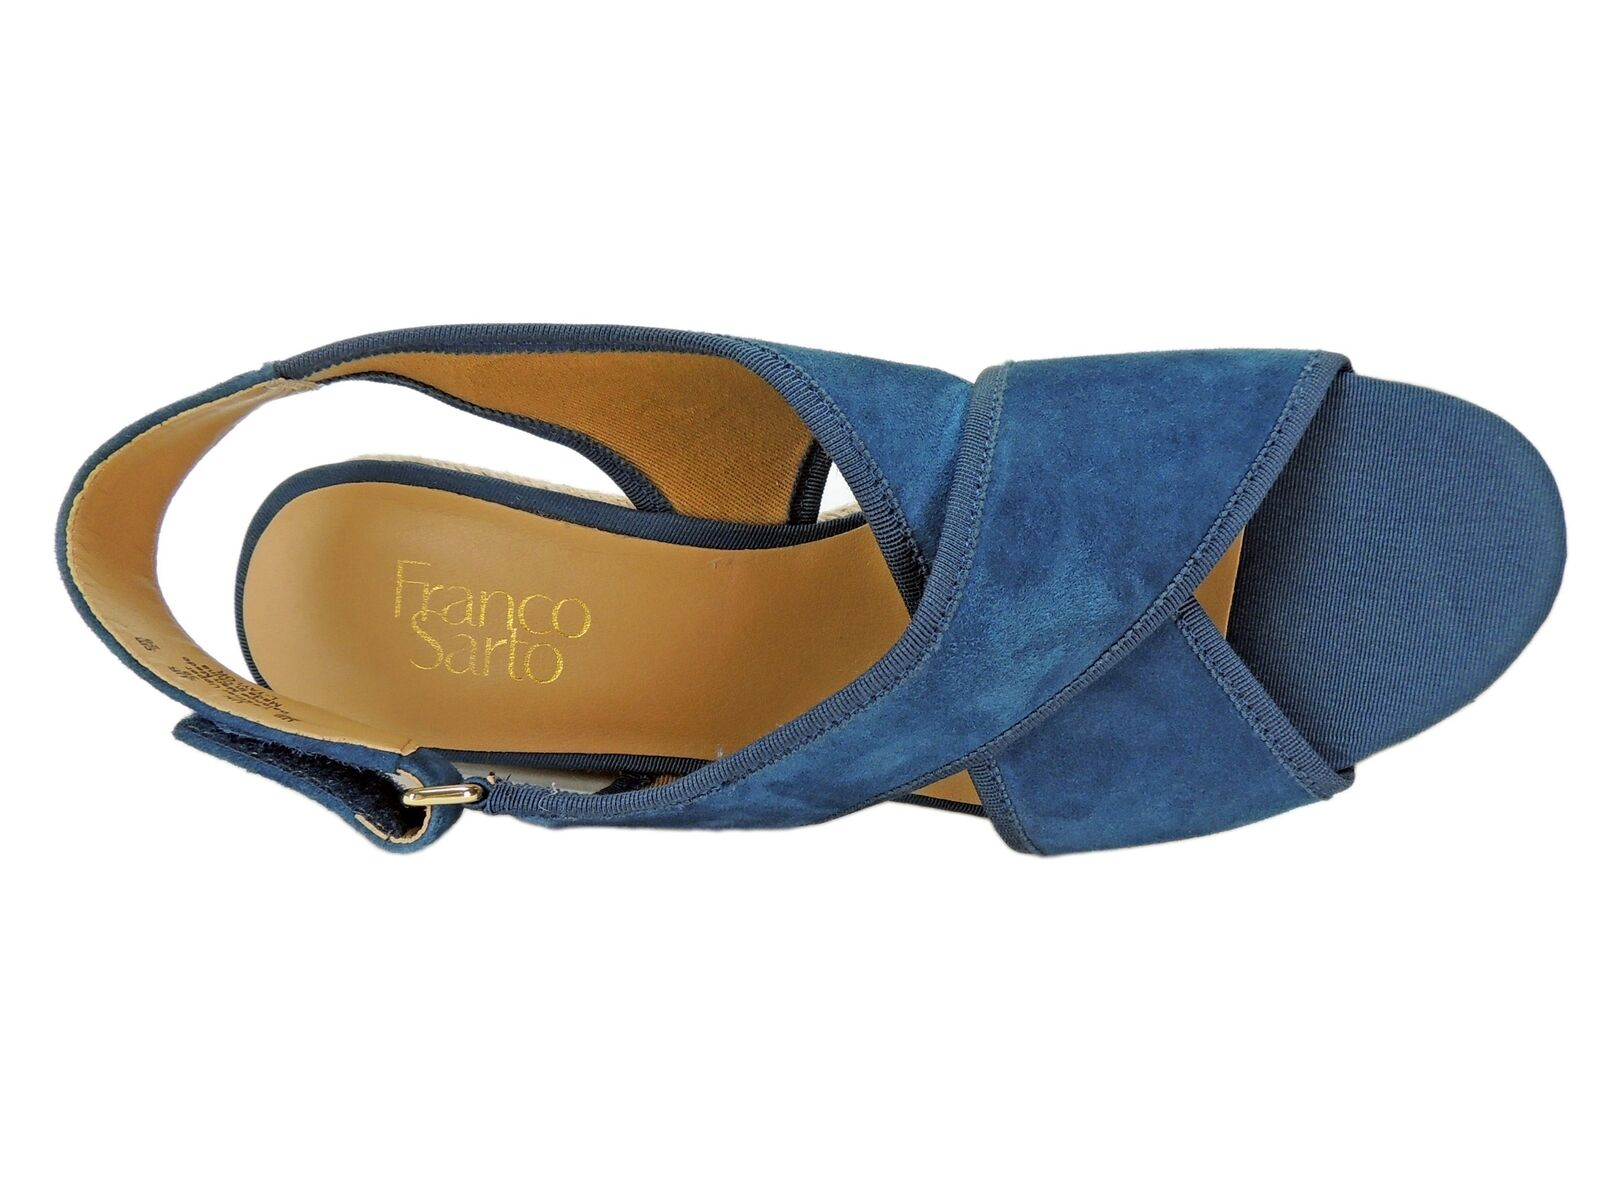 Franco Franco Franco Sarto Women's Taylor Platform Wedge Sandals Navy bluee Size 9 M 118de9